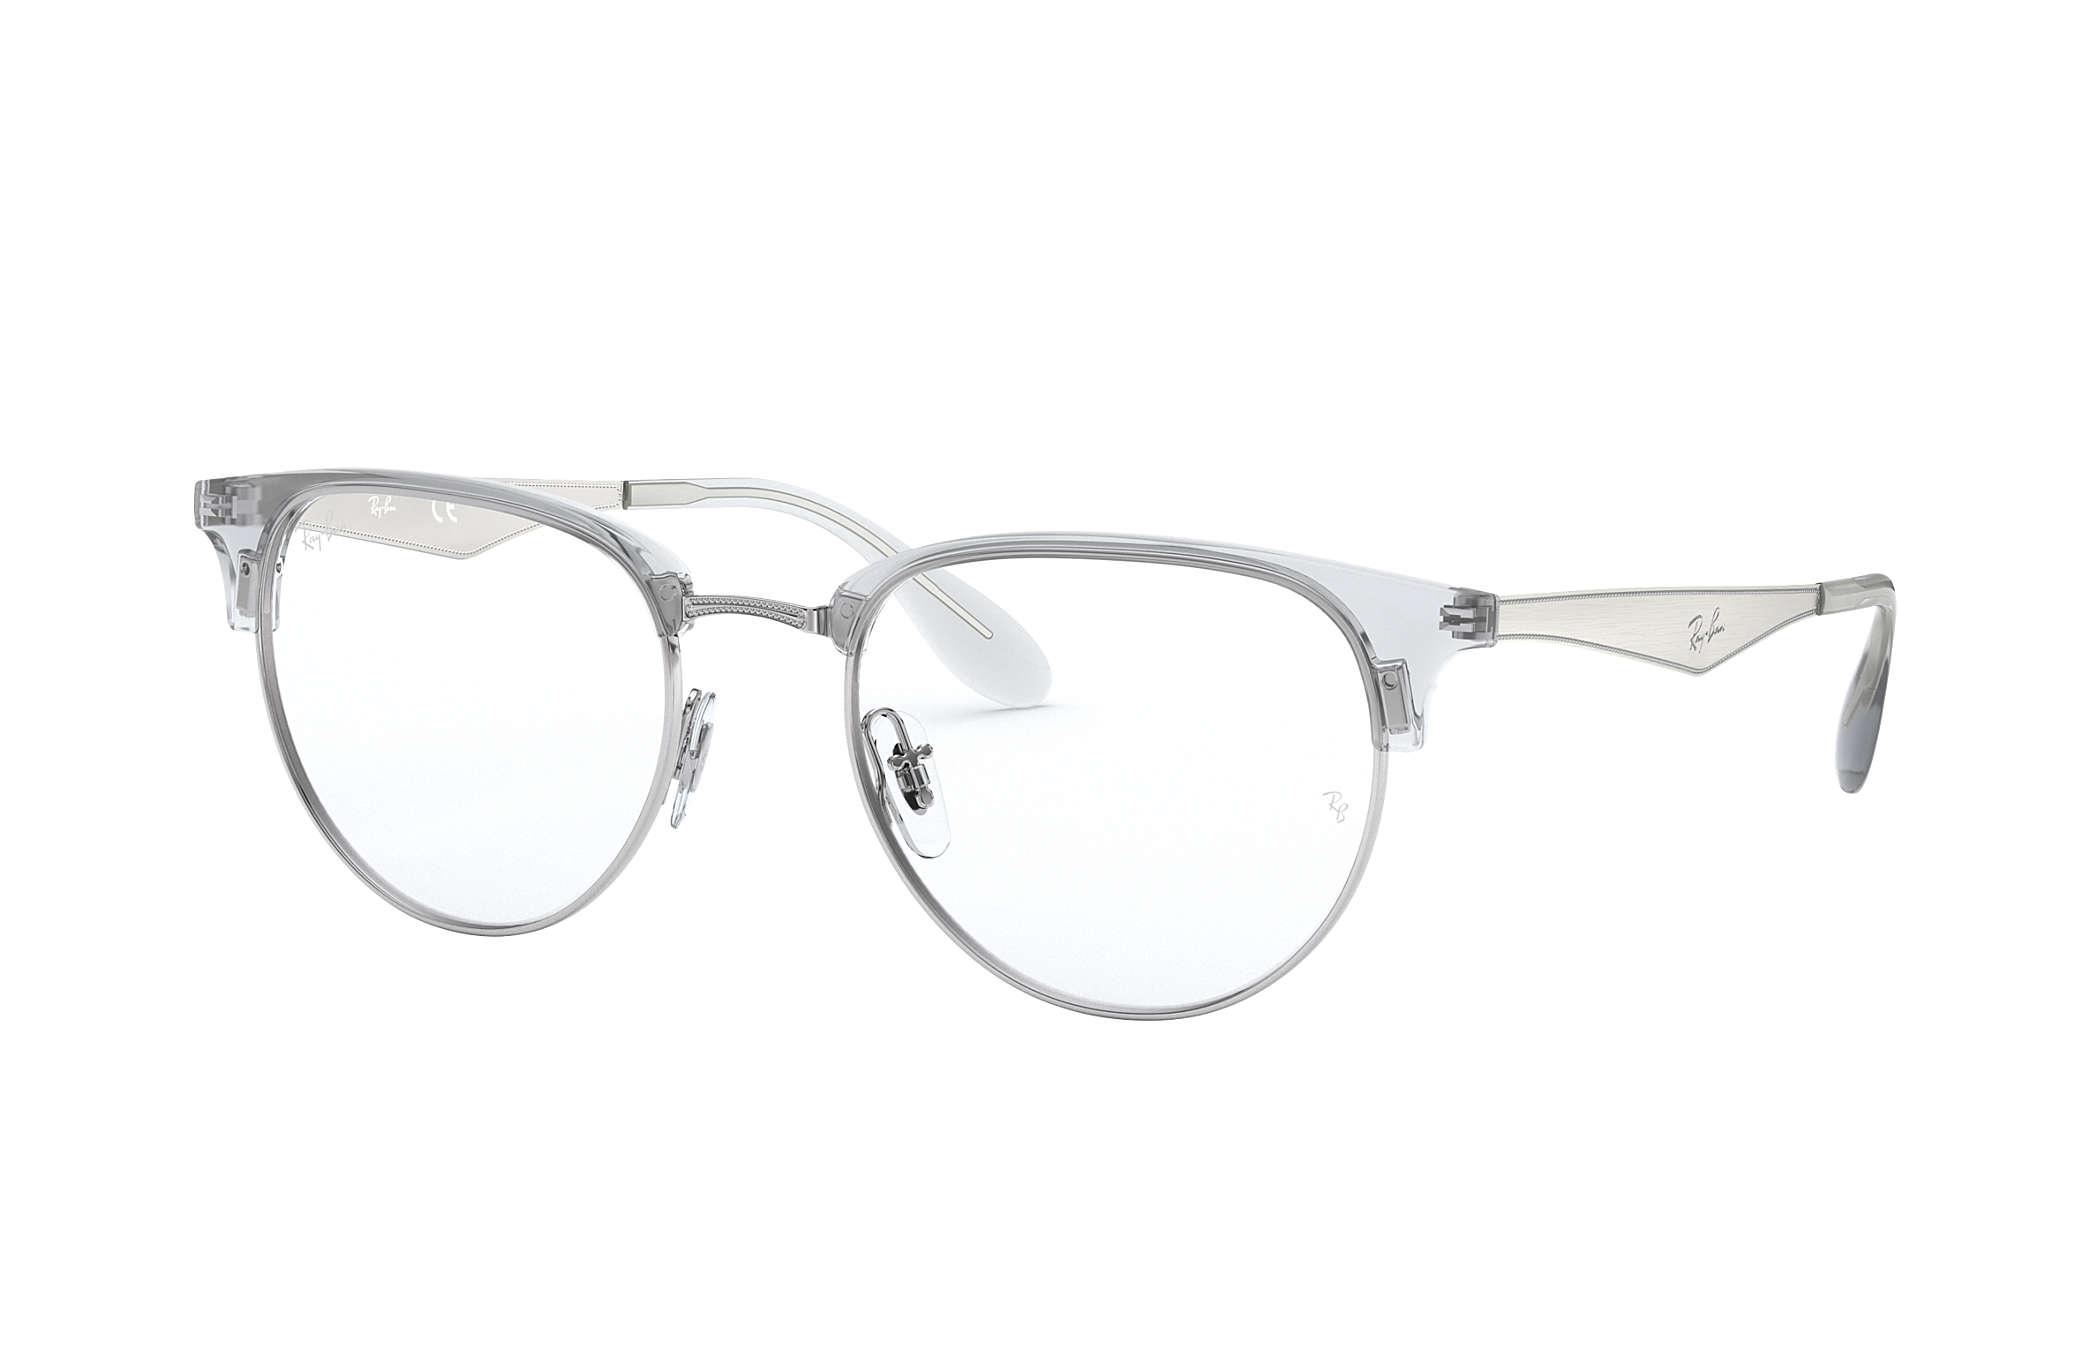 5e92c59d80c7 Ray-Ban prescription glasses RB6396 Silver - Metal - 0RX6396293653 ...